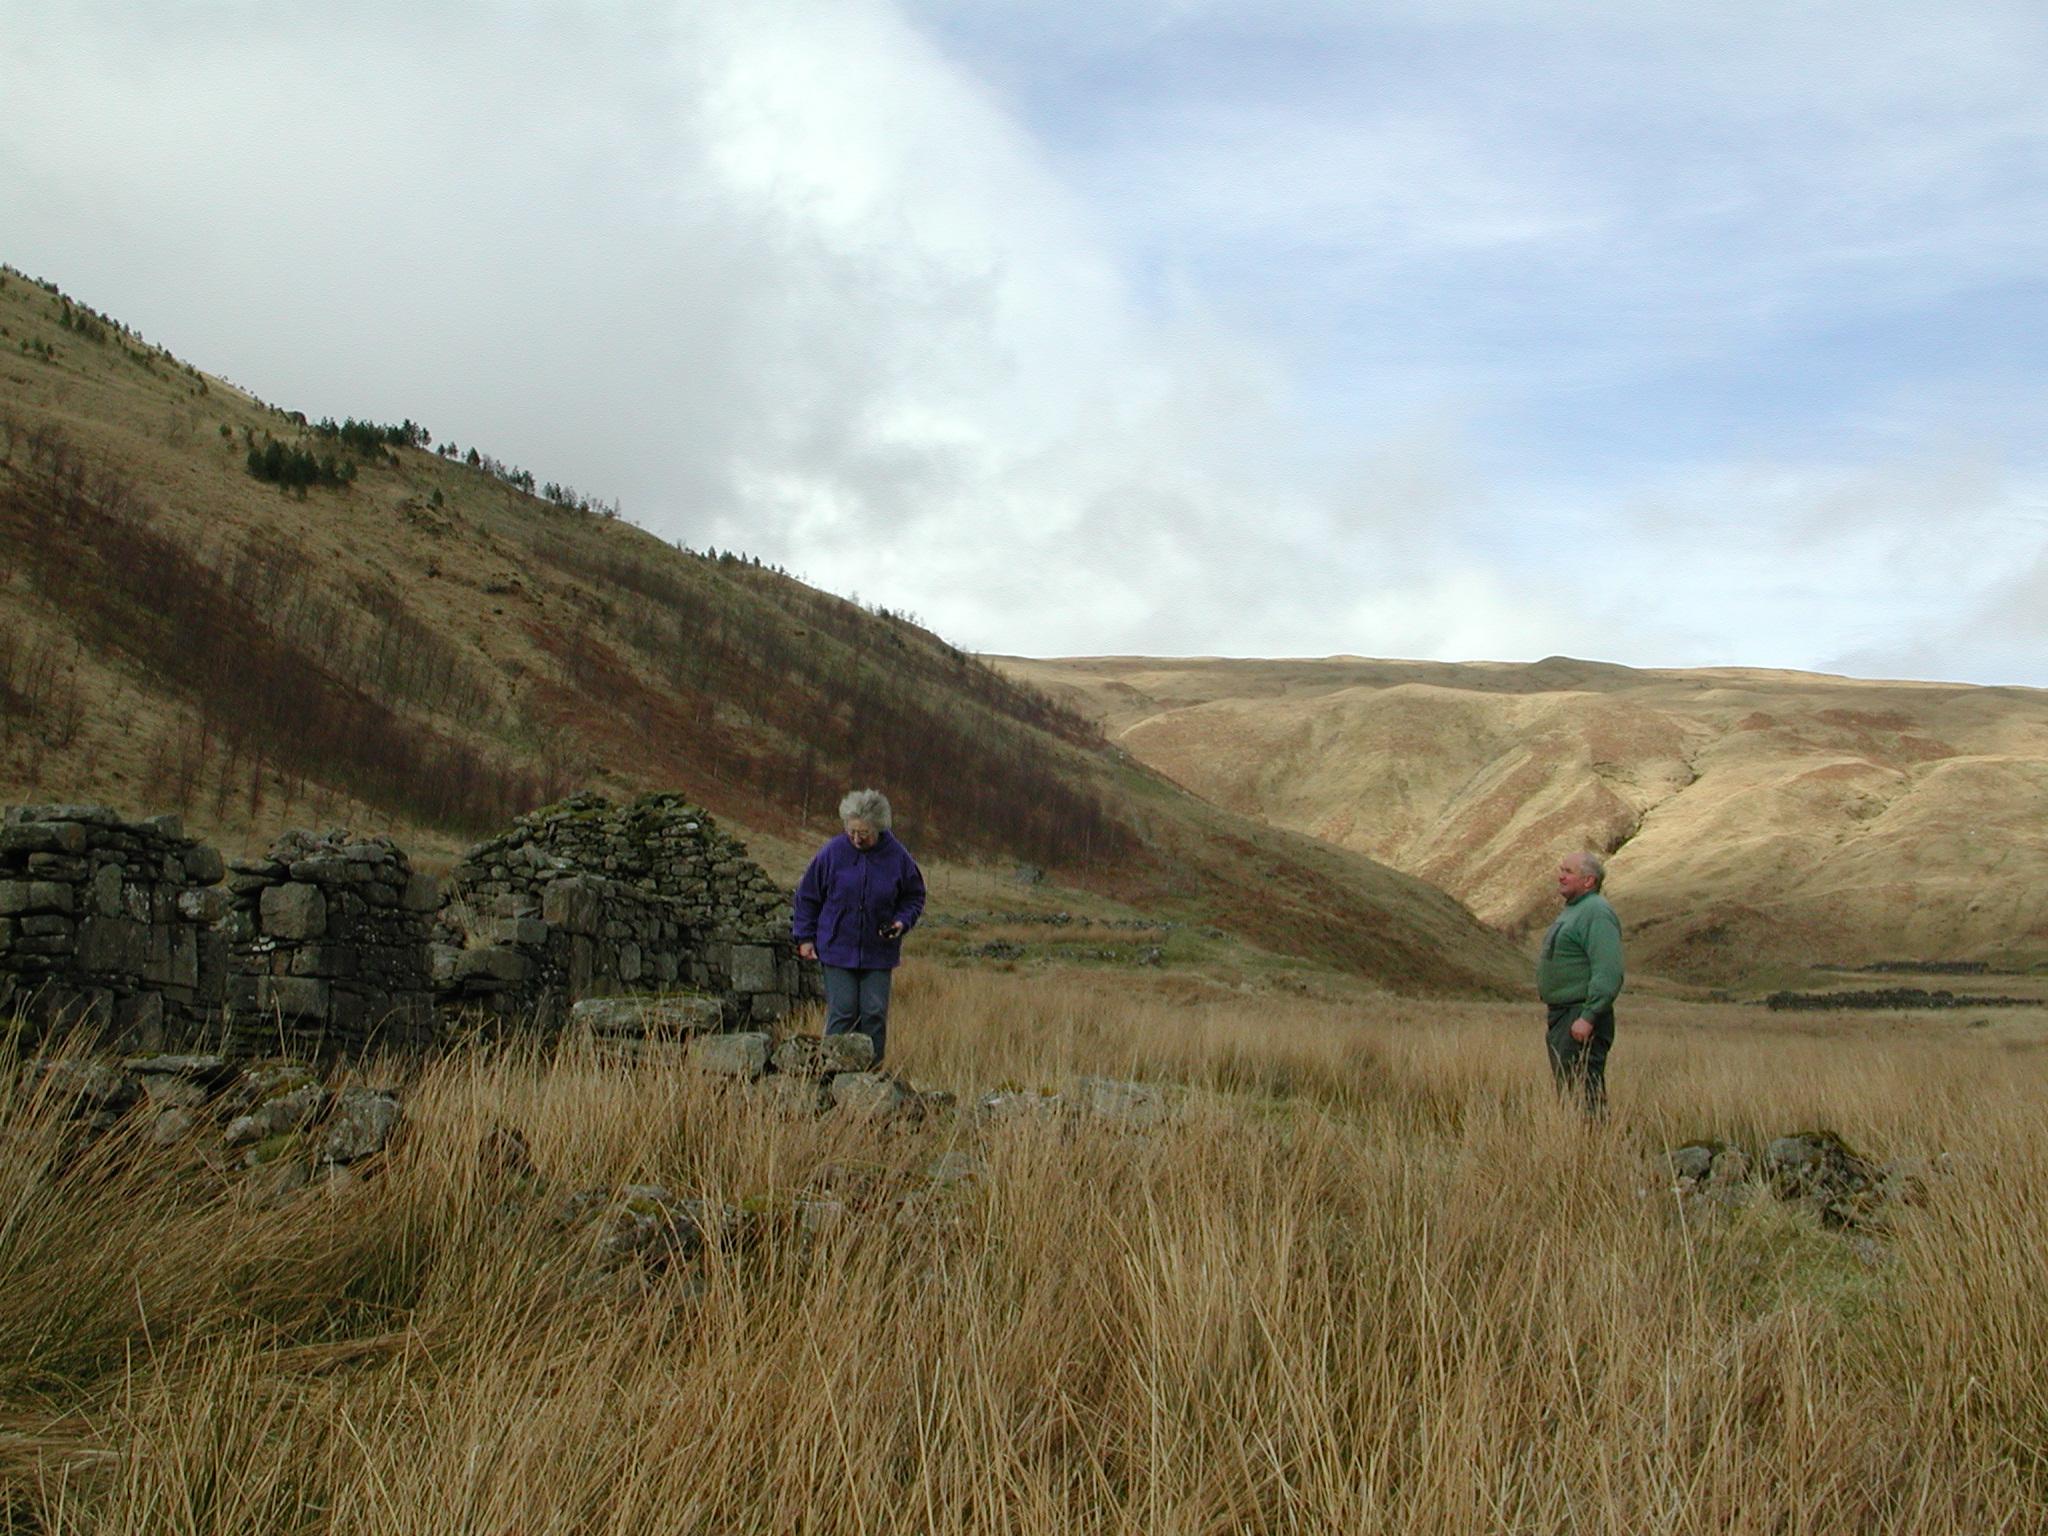 Alistair MacCallum & Alice Beattie, Ruins at head of Glen Fyne